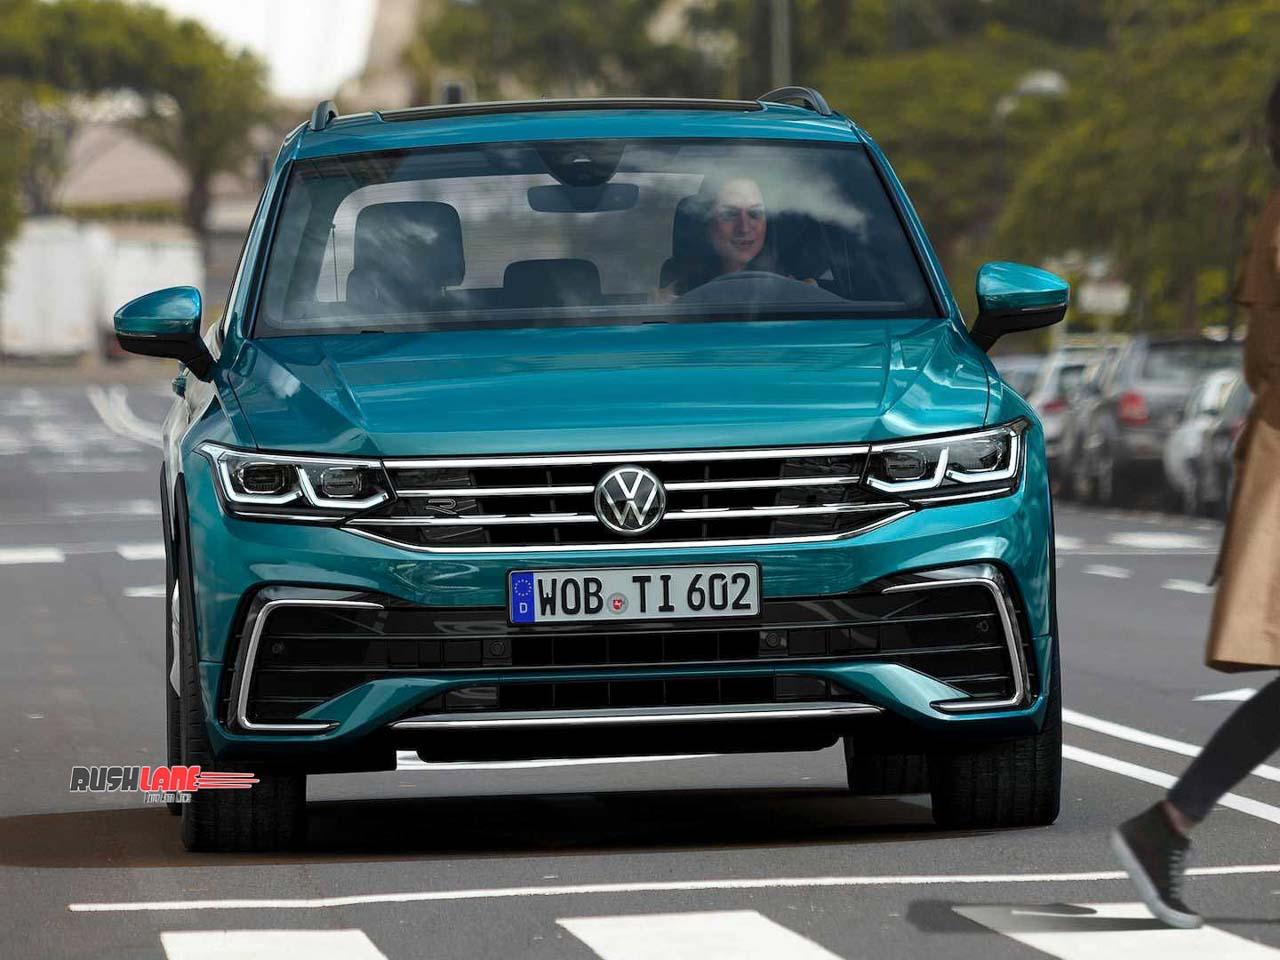 2021 VW Tiguan SUV Facelift gets new exteriors, interiors – Photos